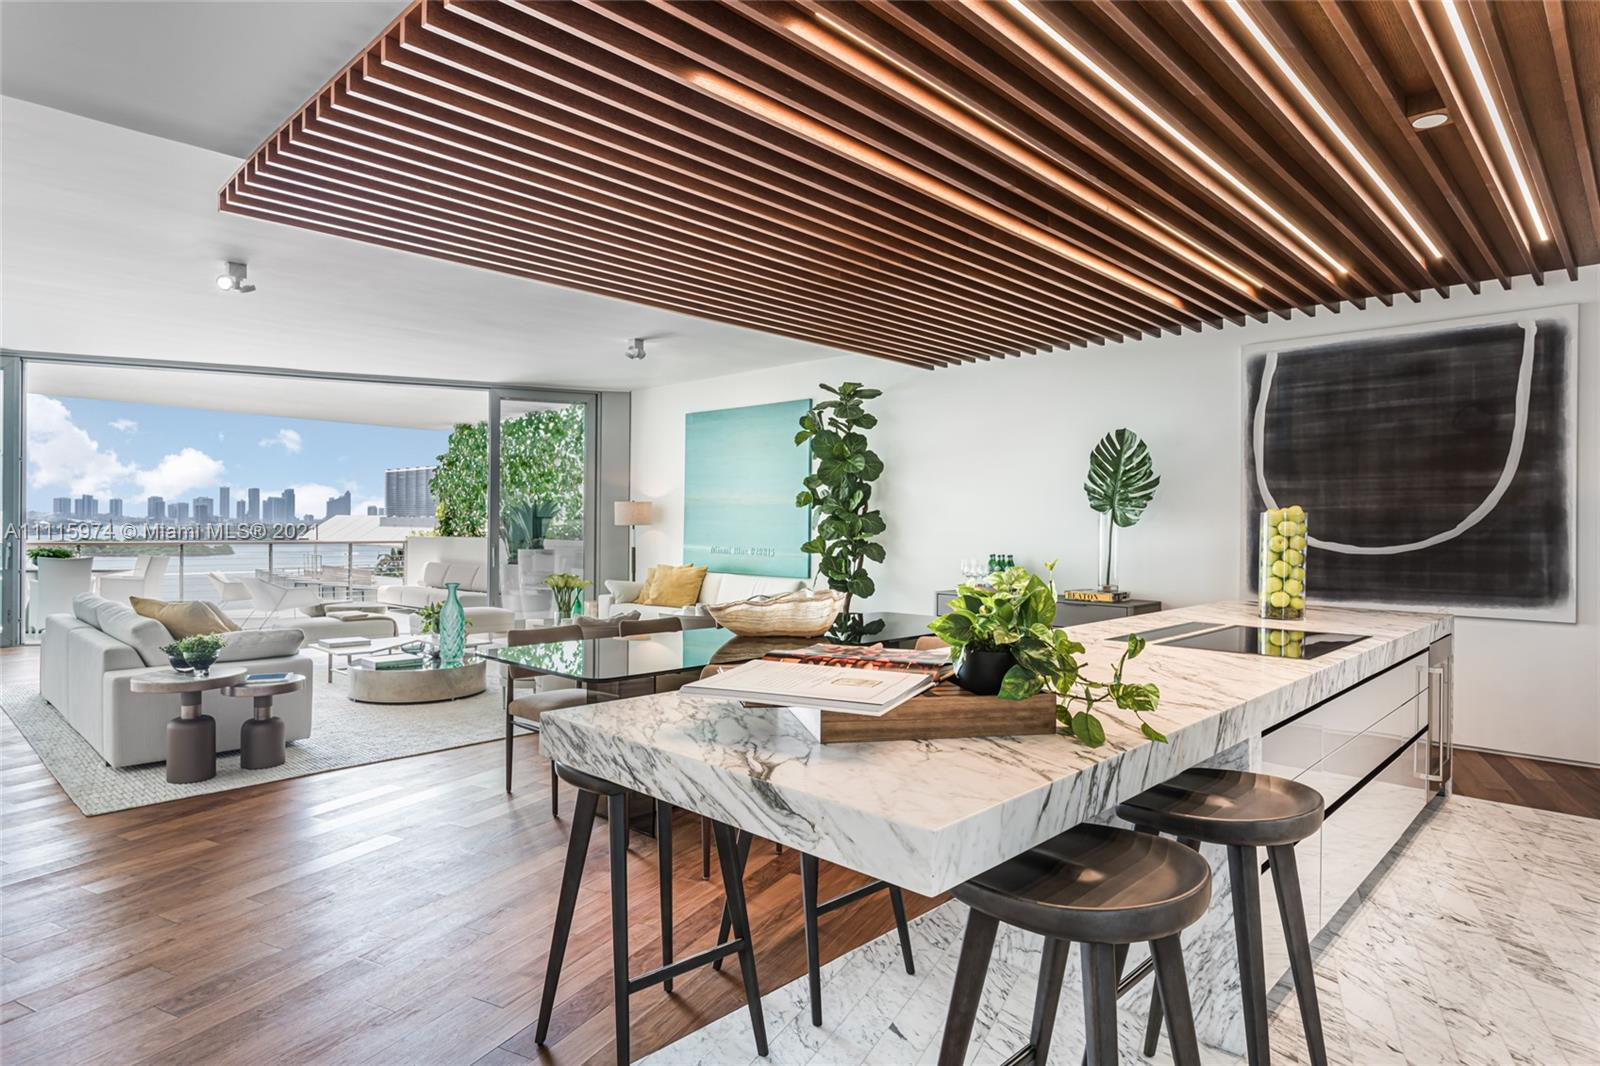 Monad Terrace Condo,For Sale,Monad Terrace Brickell,realty,broker,condos near me